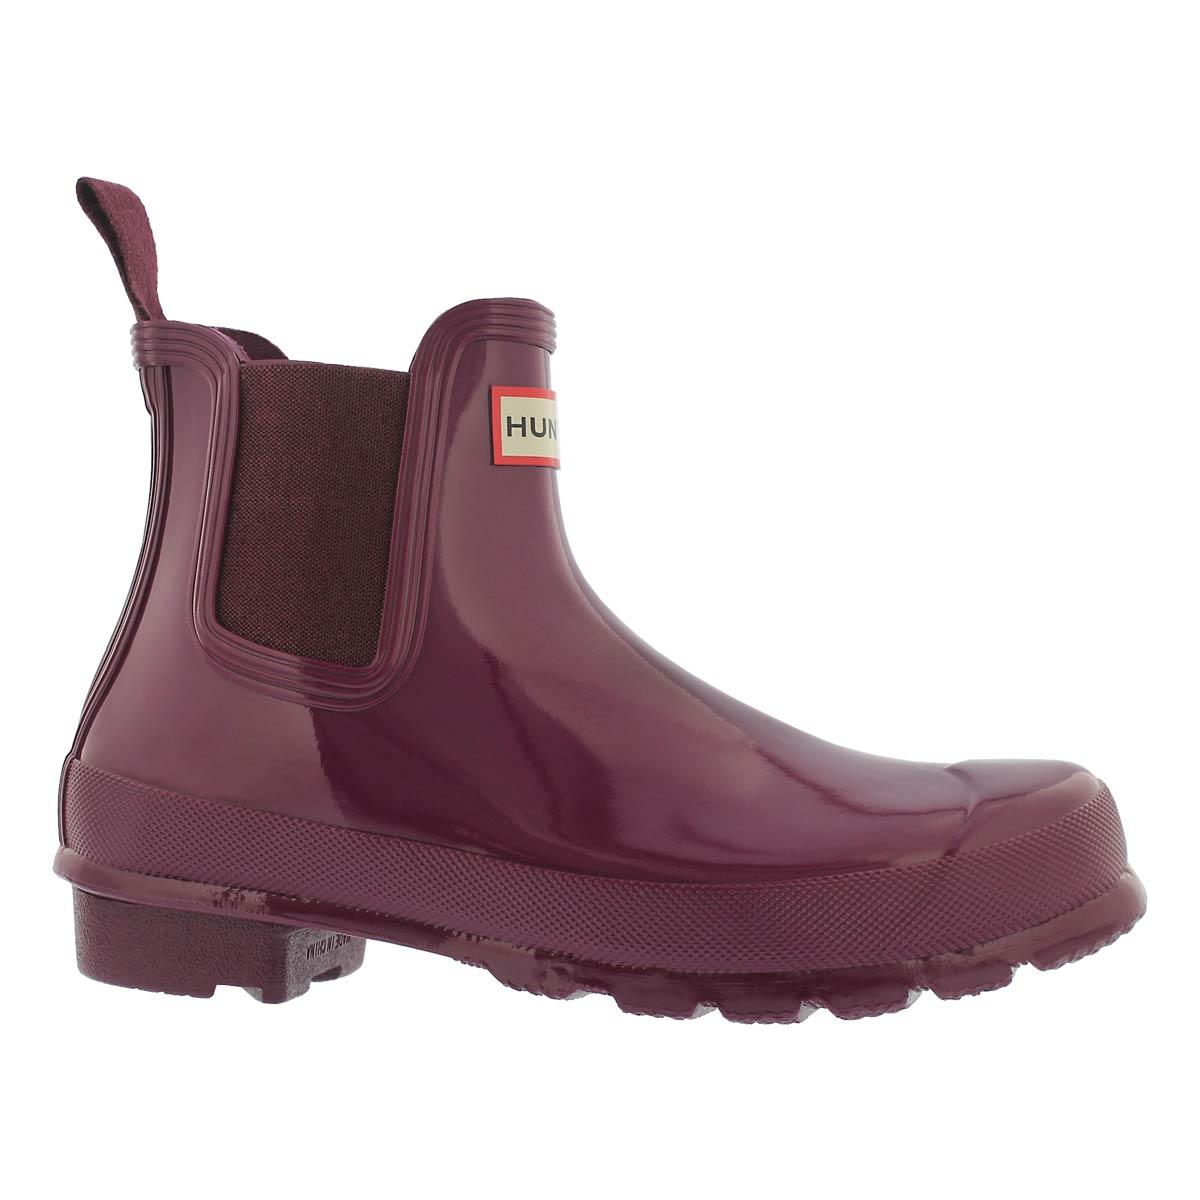 Women's ORIGINAL CHELSEA gloss violet rain boots